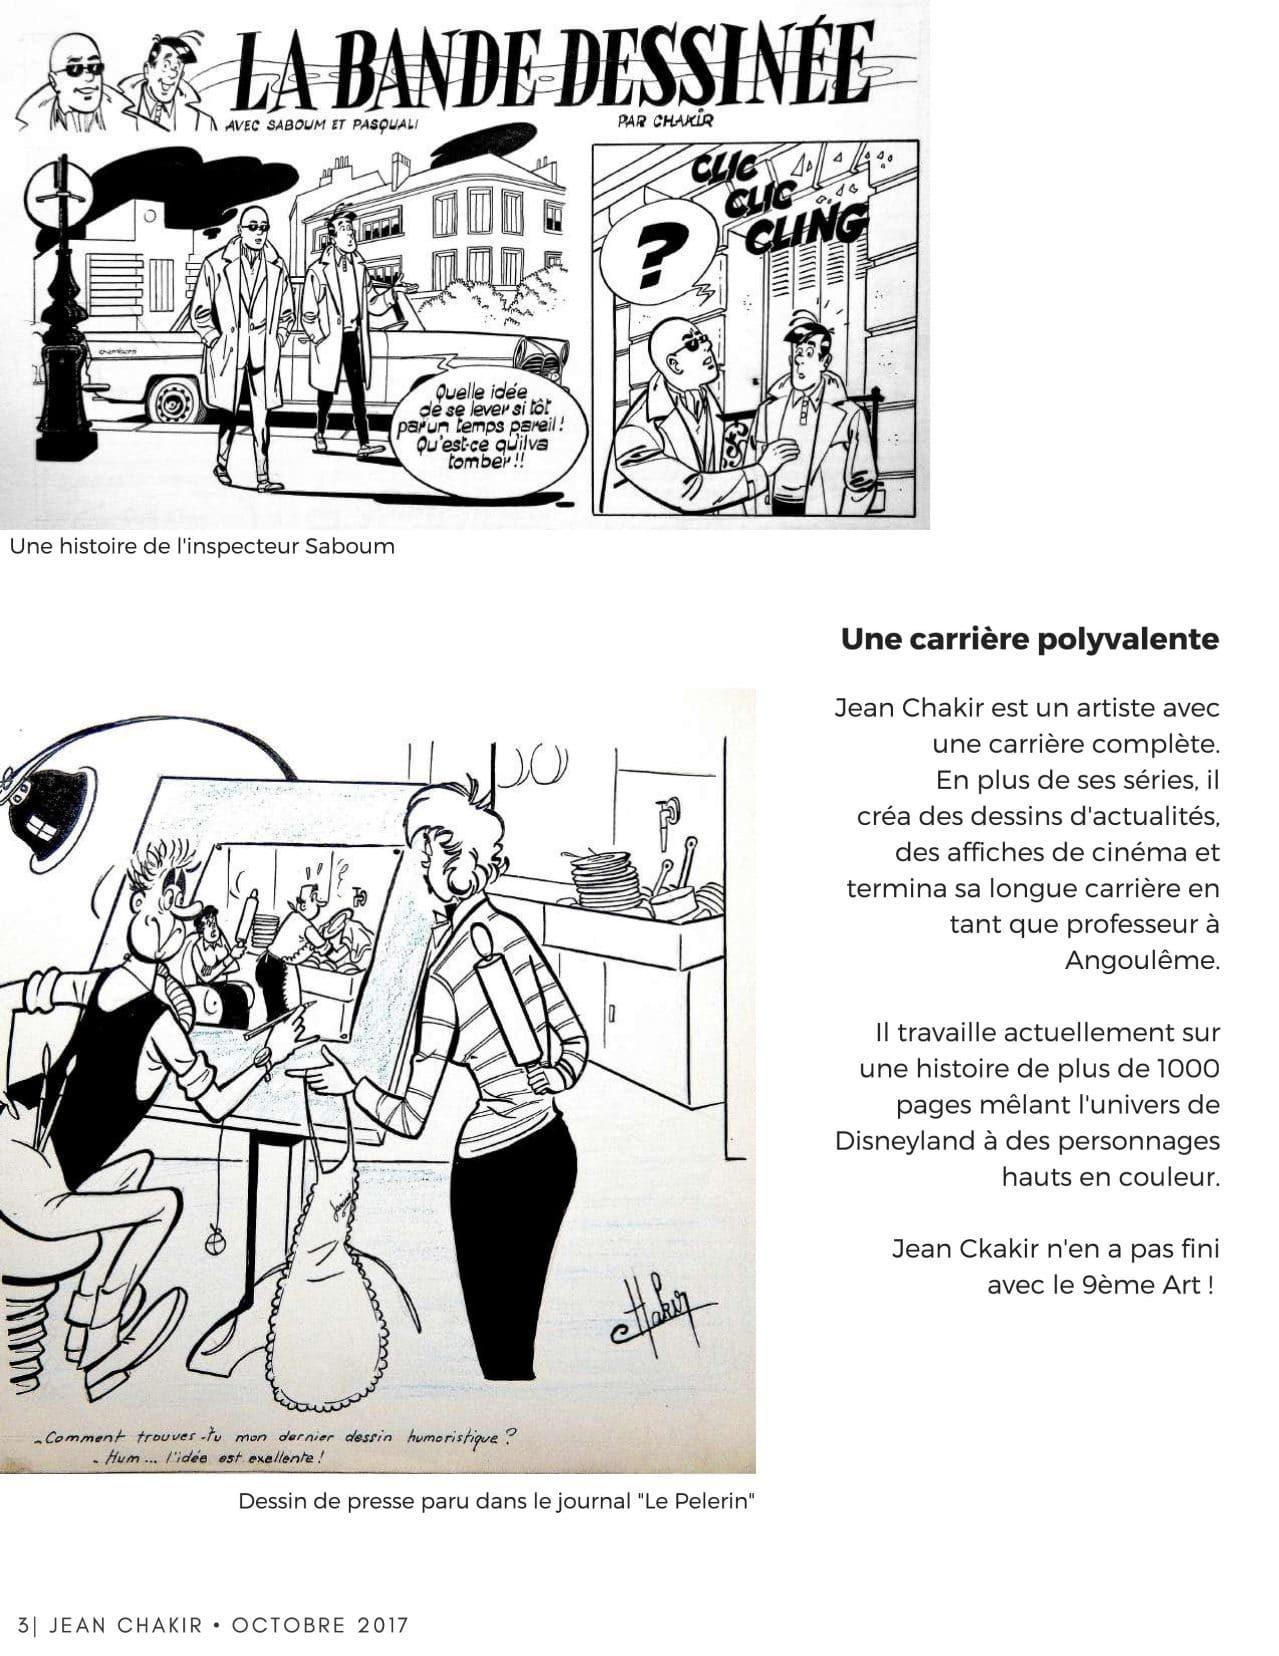 vie de Jean Chakir galerie Art-Maniak 2017